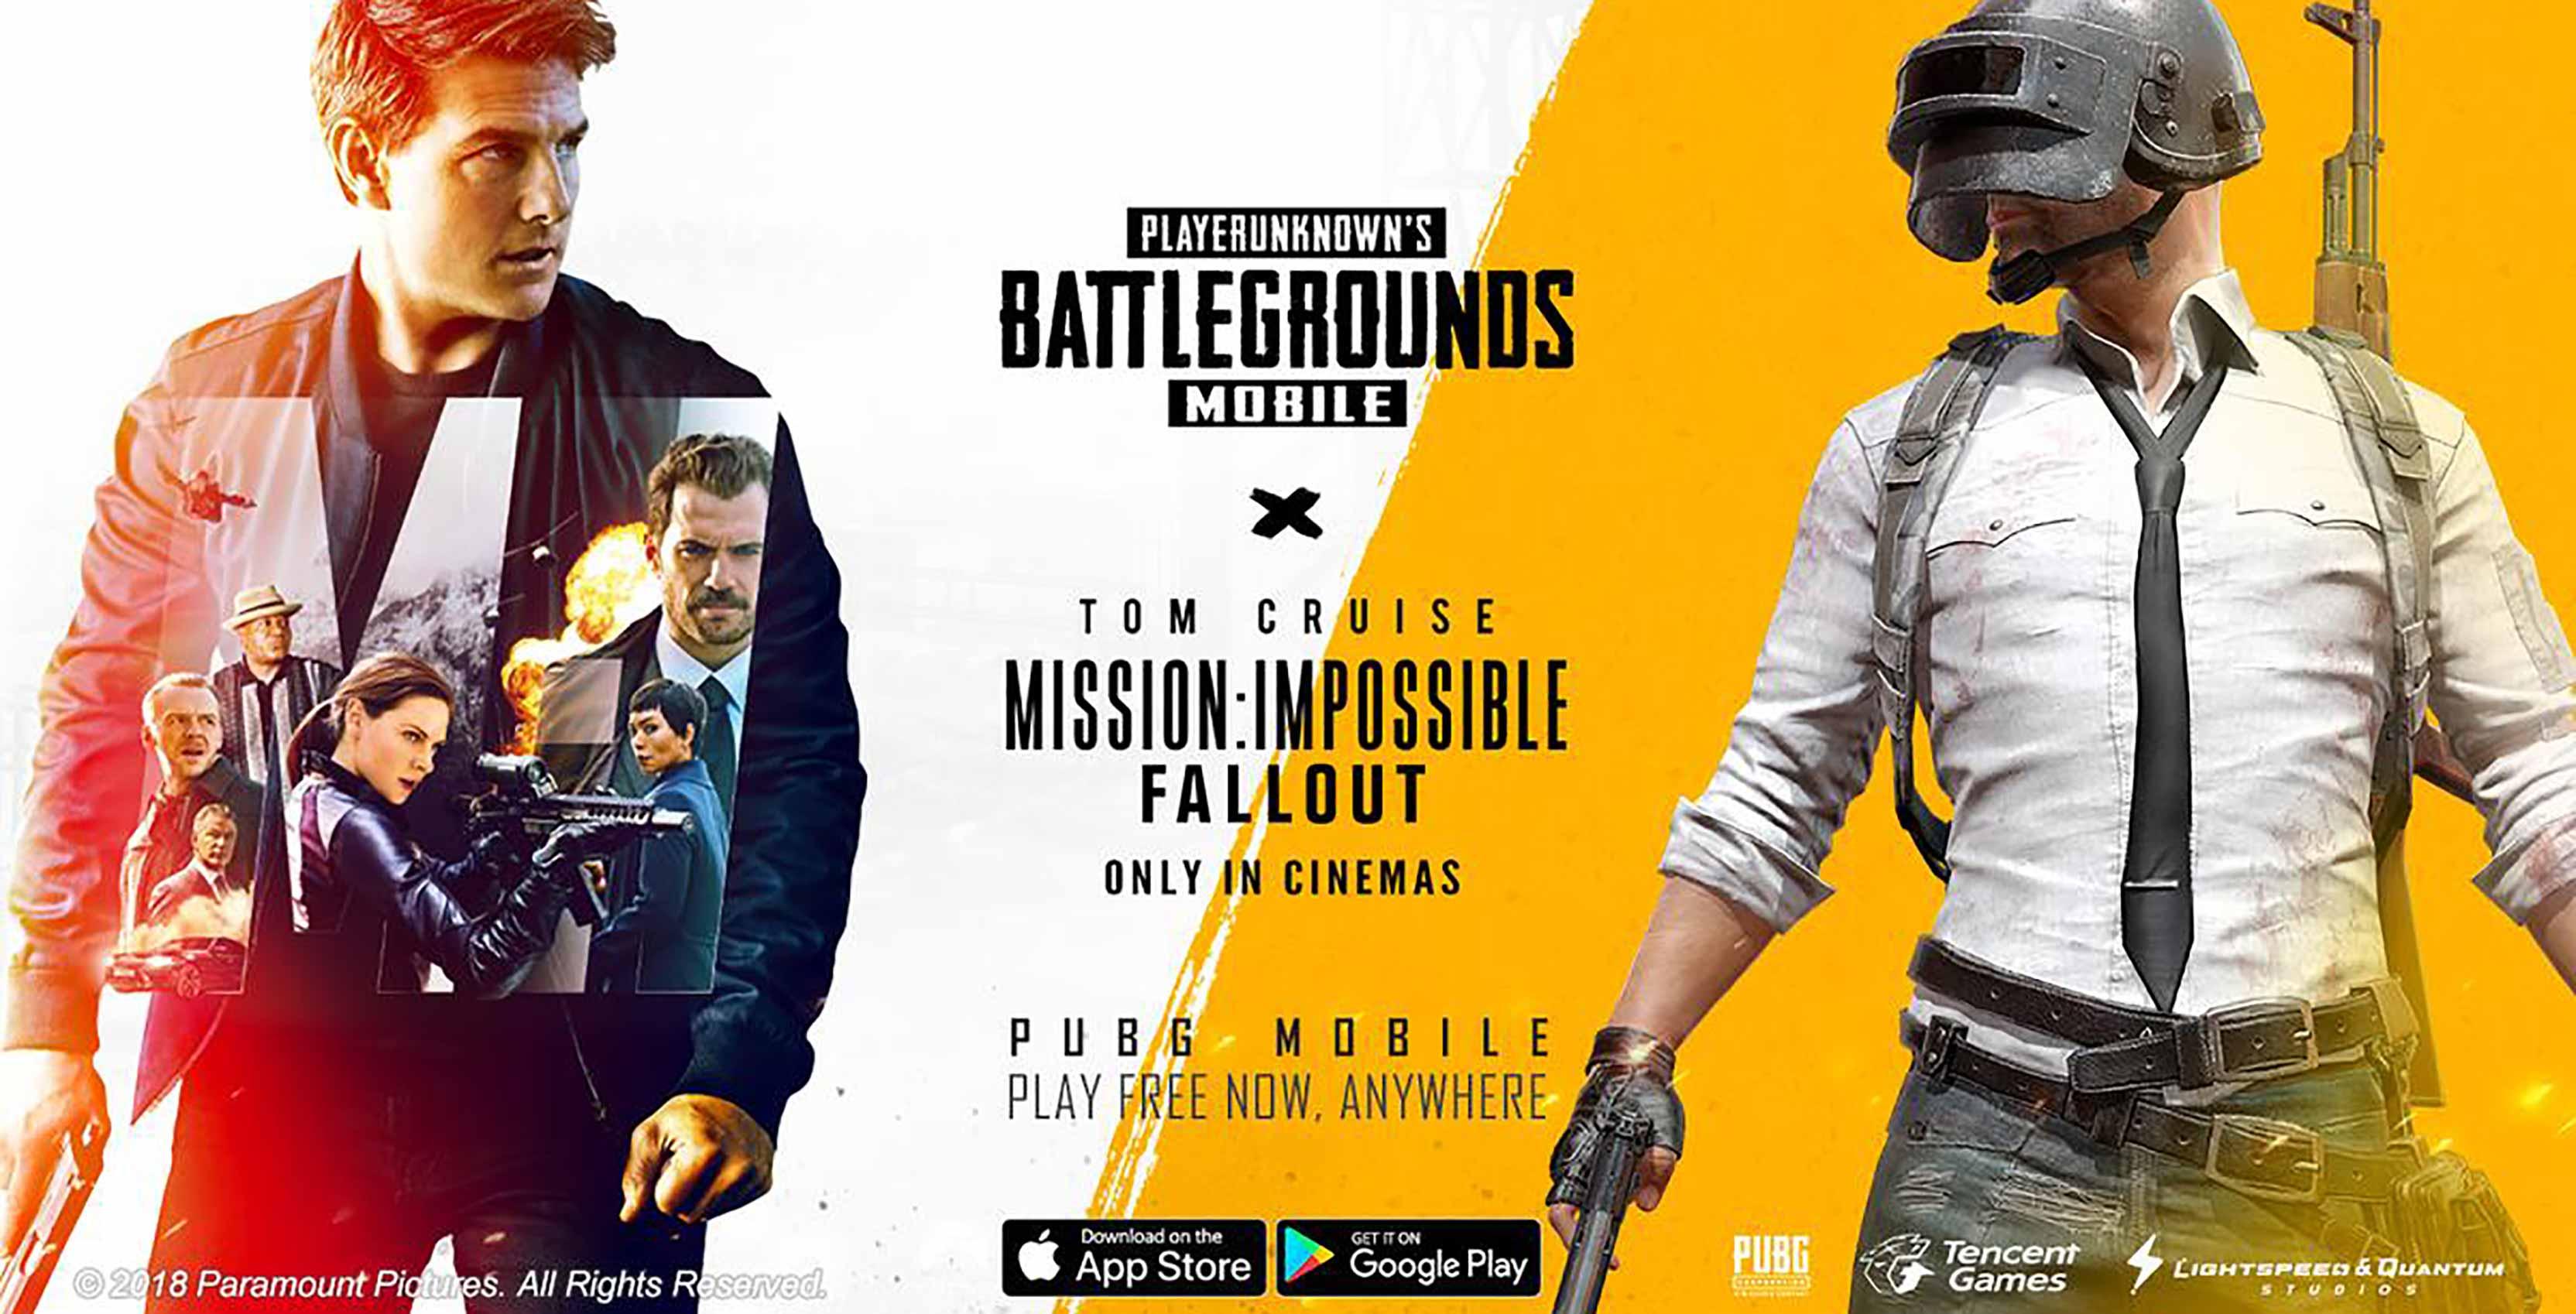 Mission: Impossible PUBG Mobile event